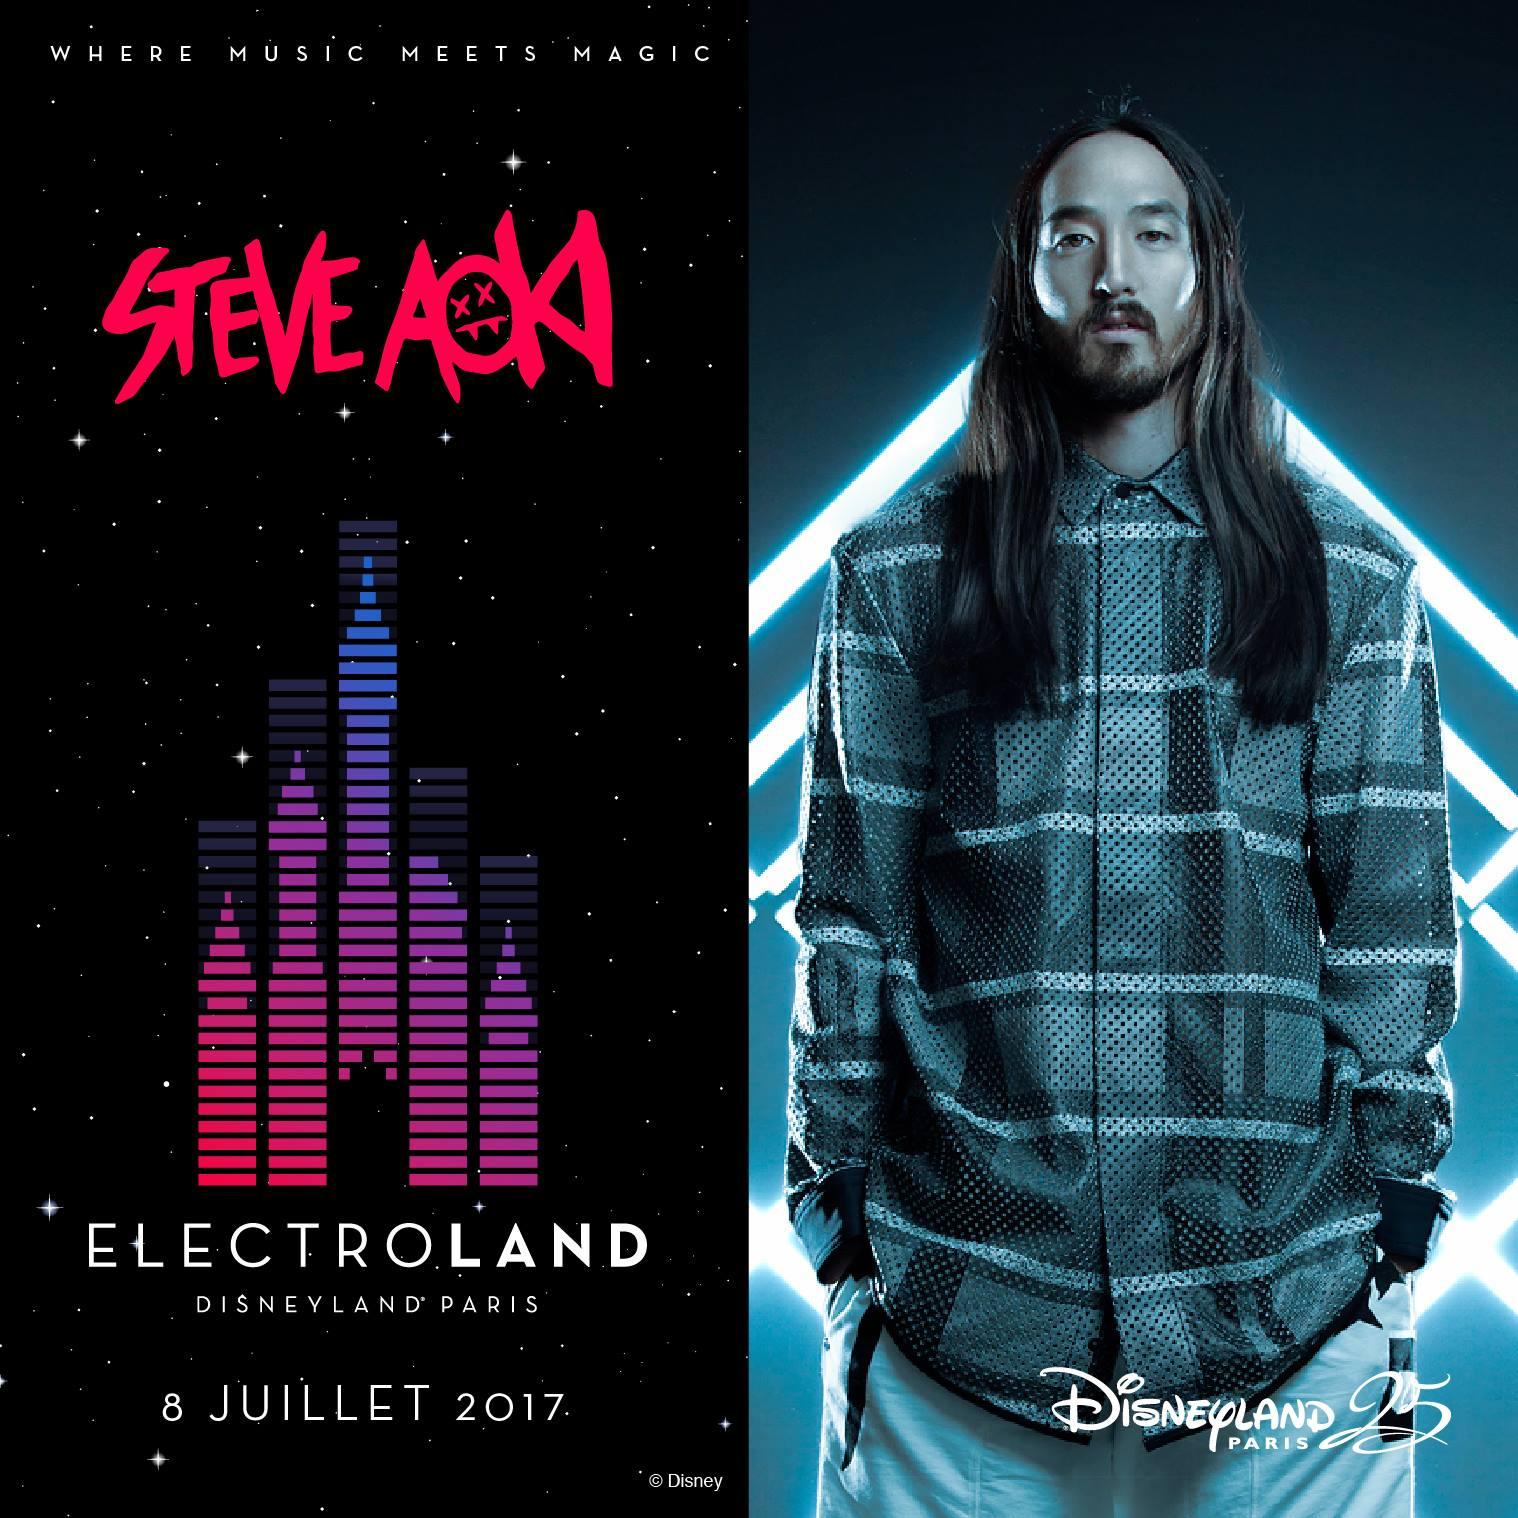 [Electroland] Le 8 juillet 2017 - Festival EDM - Page 2 04-Steve_Aoki